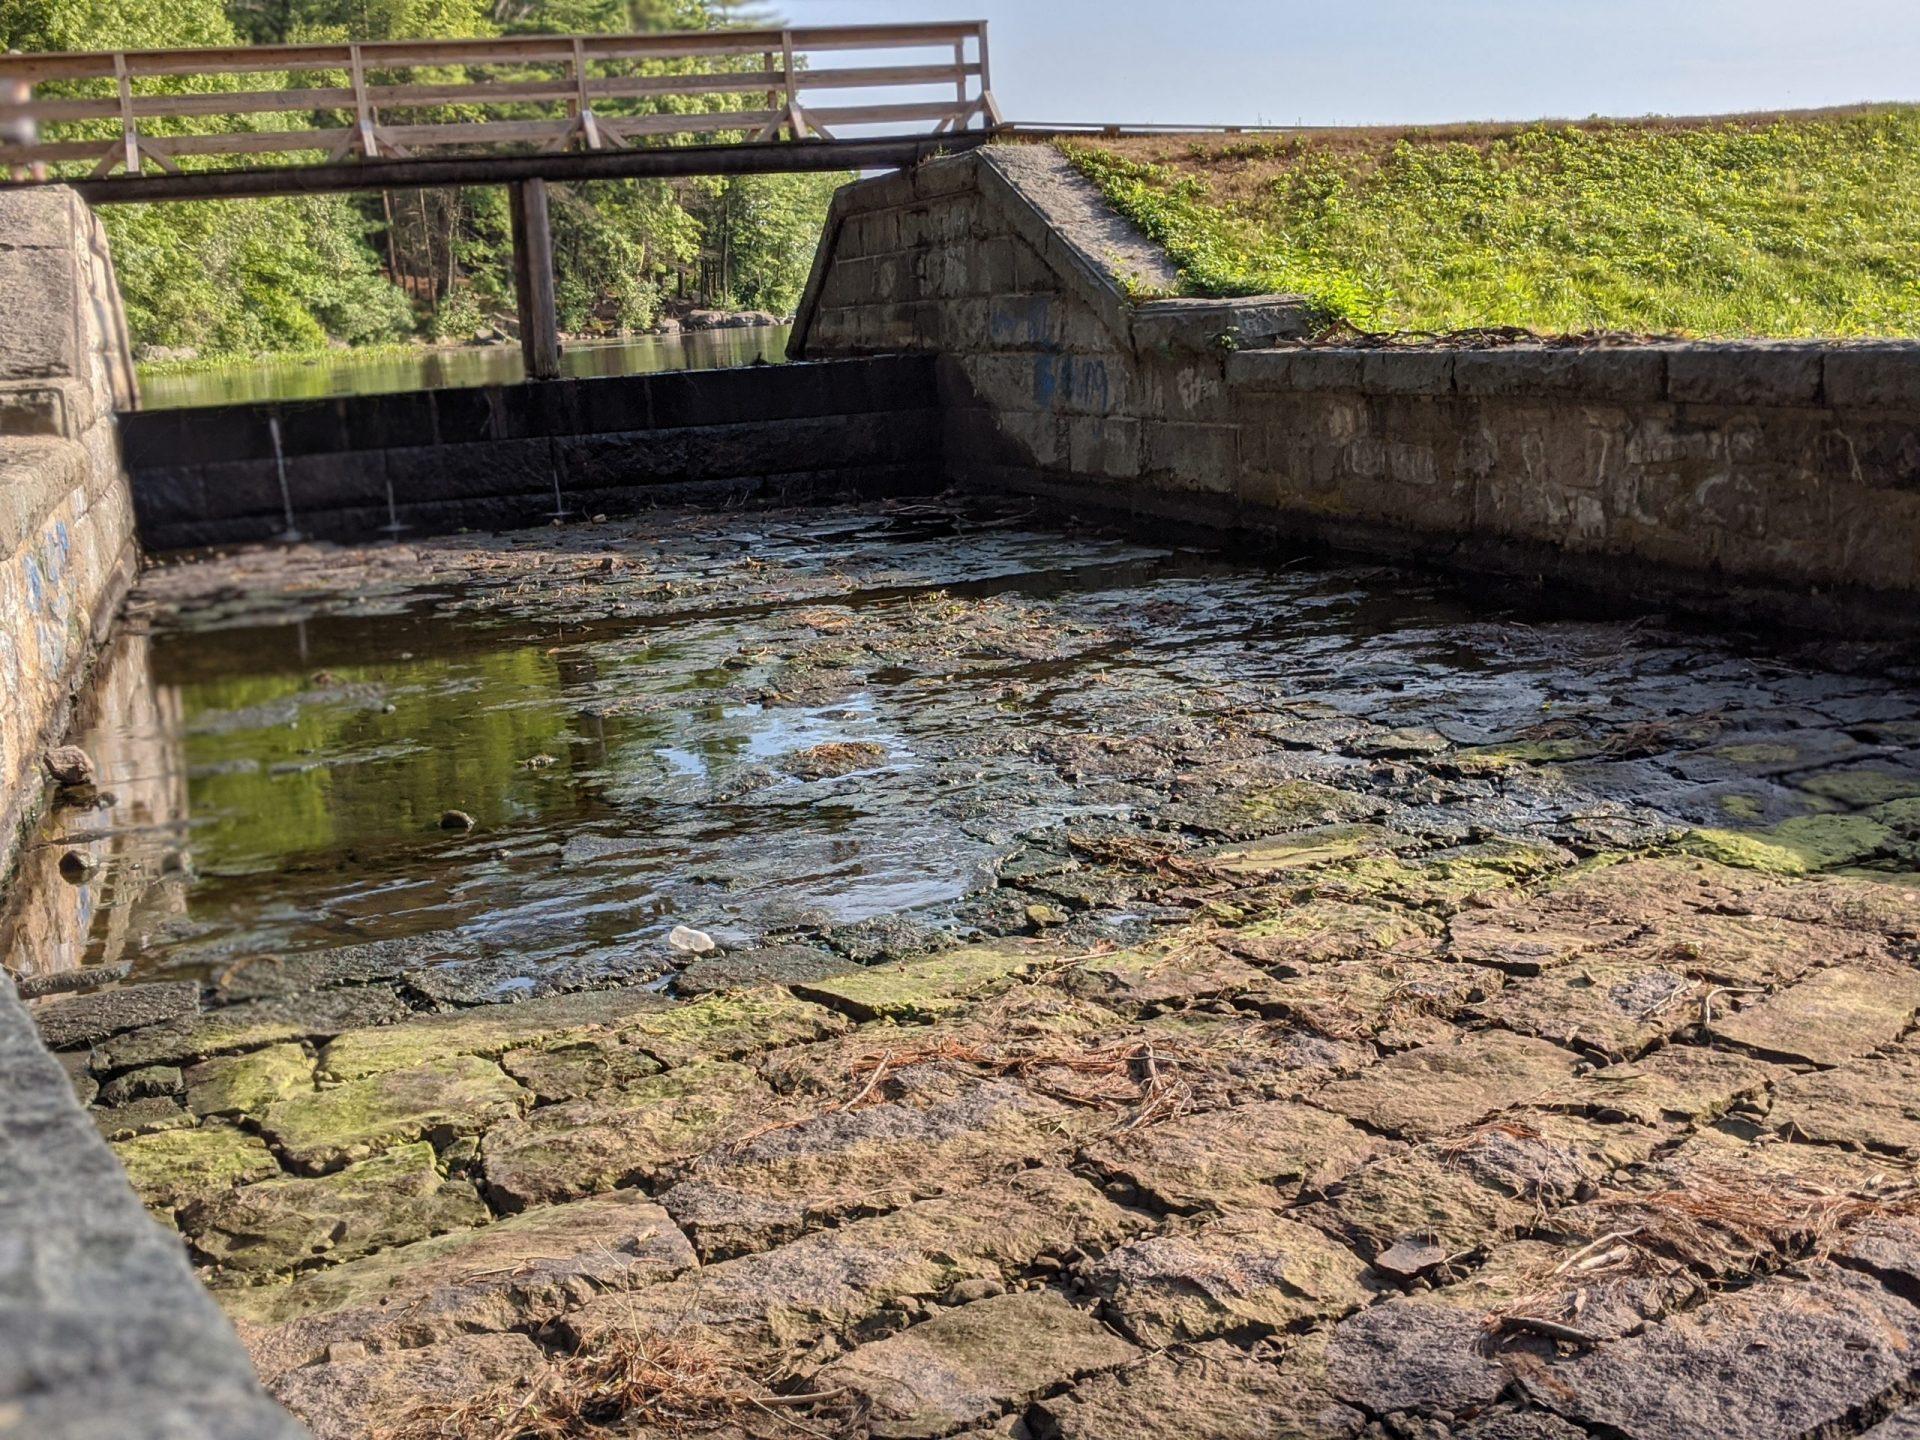 Ashland Dam Spillway - dry in July 2020